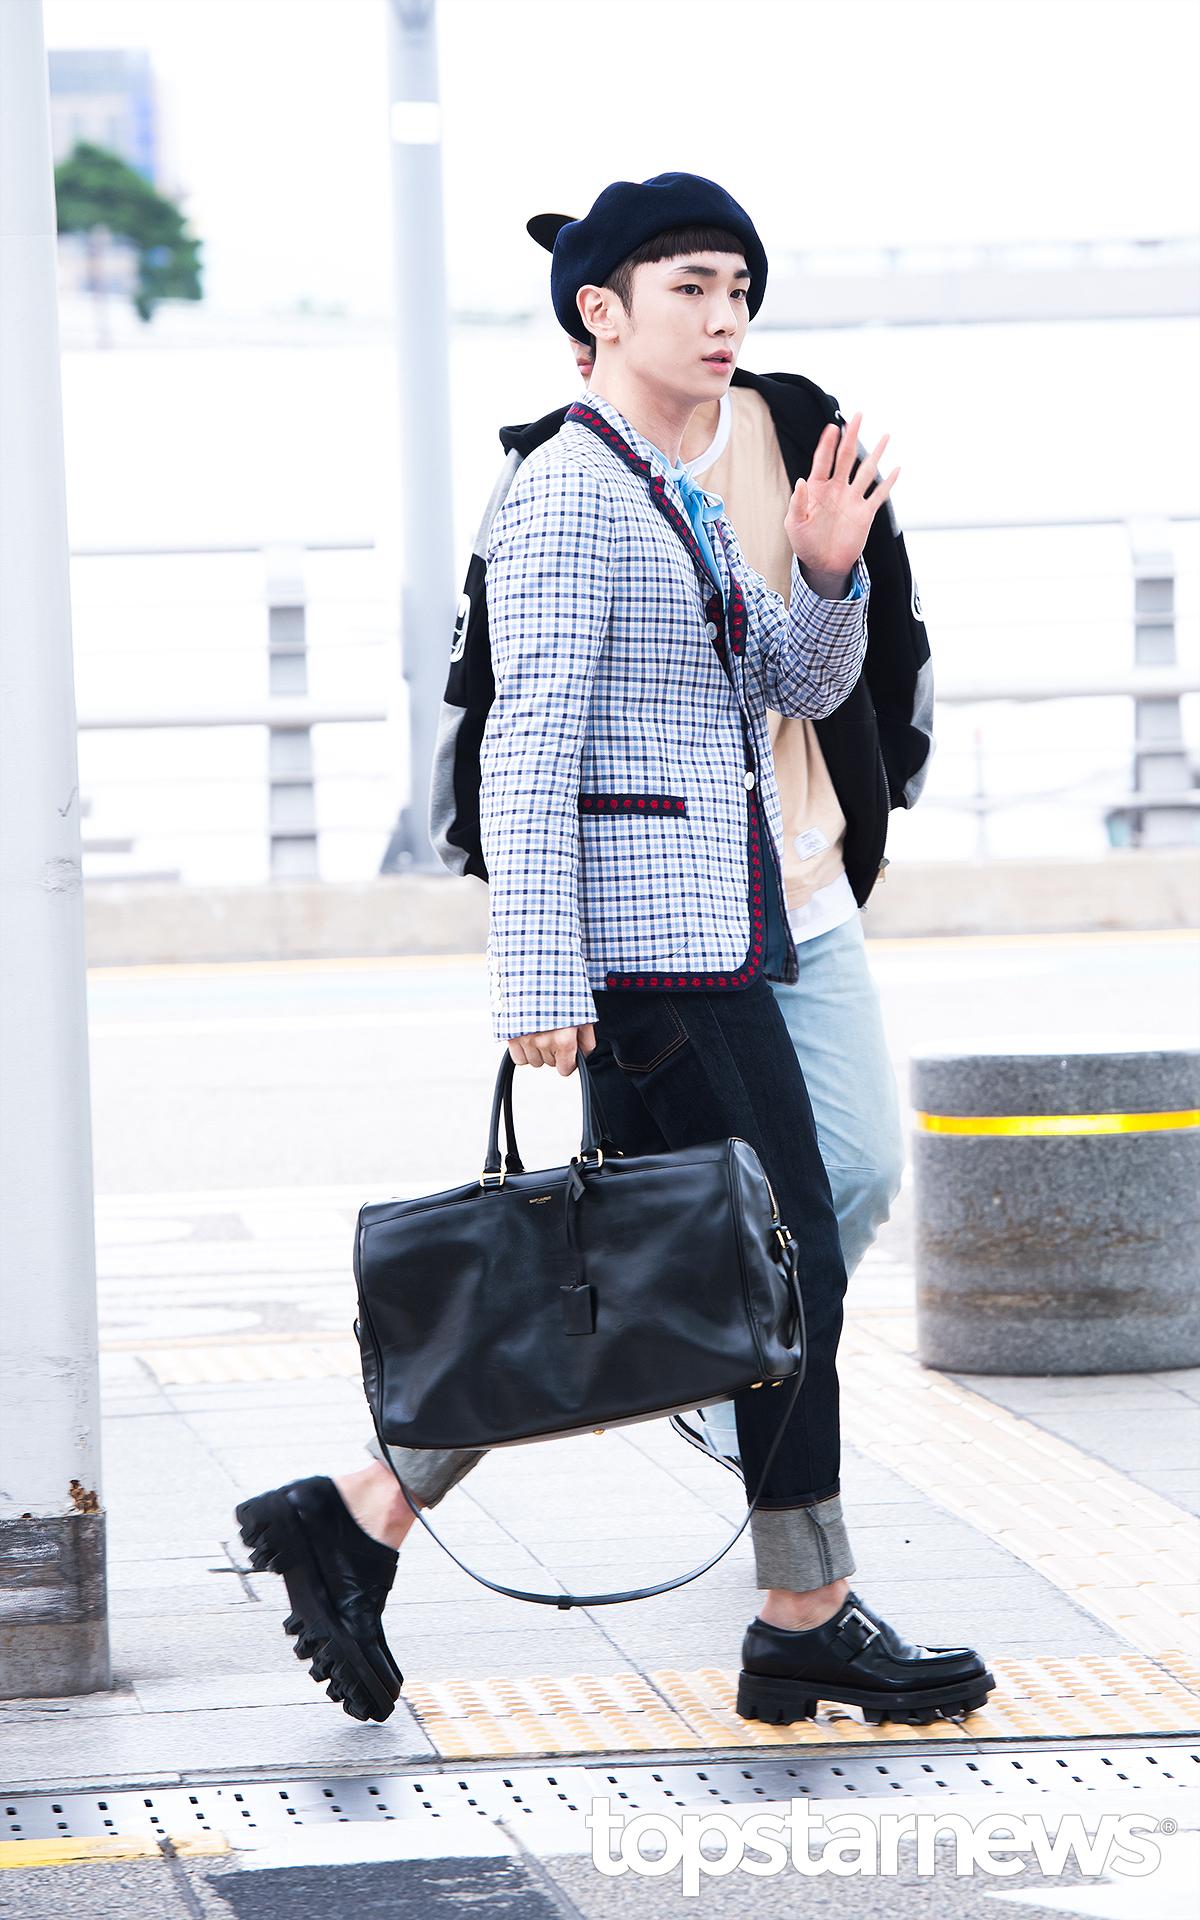 [IMG/160715] Jonghyun, Key @ Aeropuerto Incheon hacia Japón. Pf5Javot